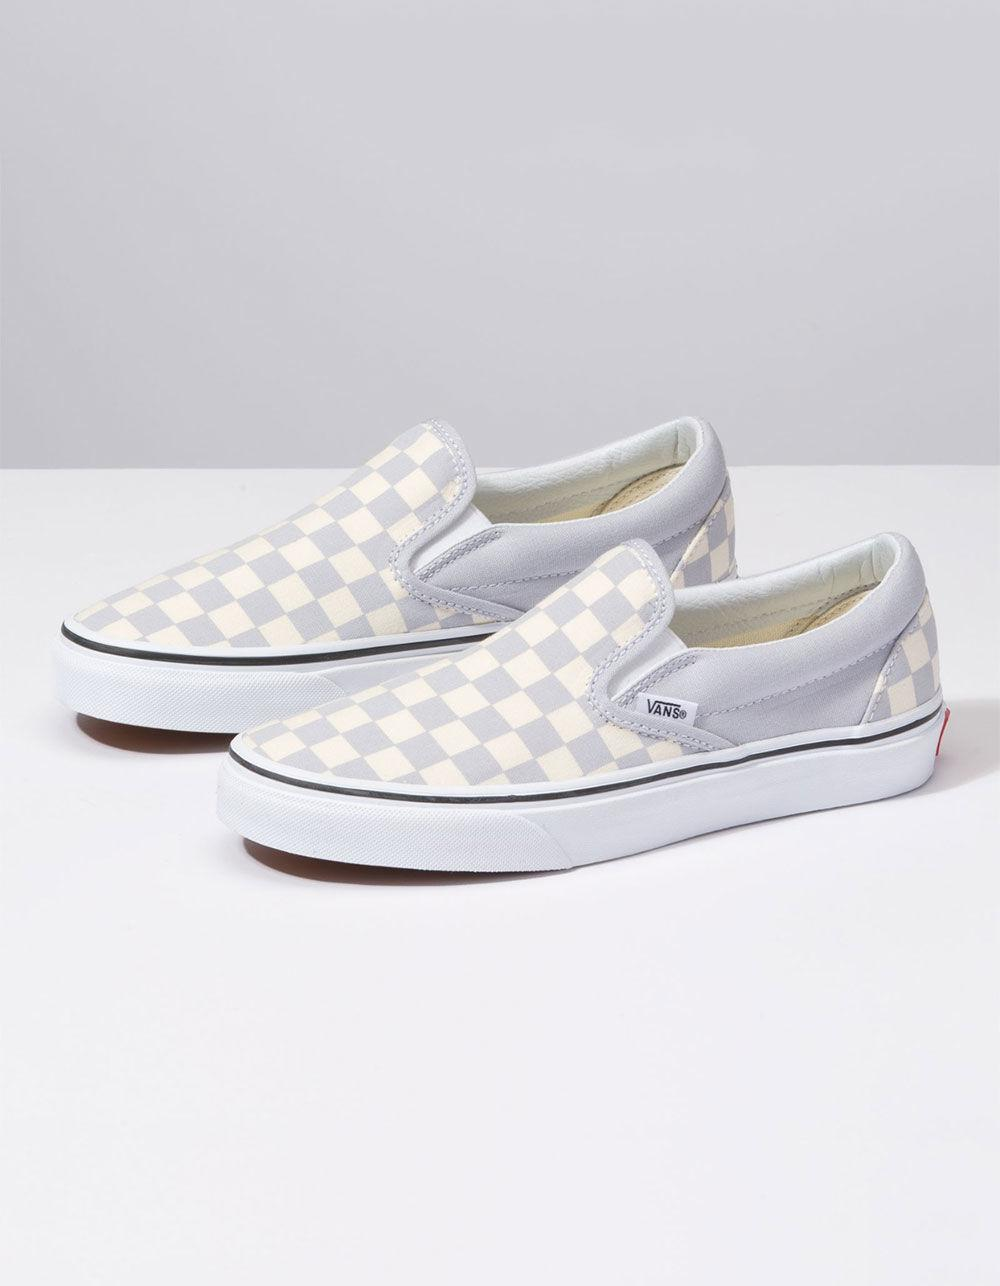 db30e839a3e887 Lyst - Vans Checkerboard Gray Dawn   True White Womens Slip-on Shoes in  White